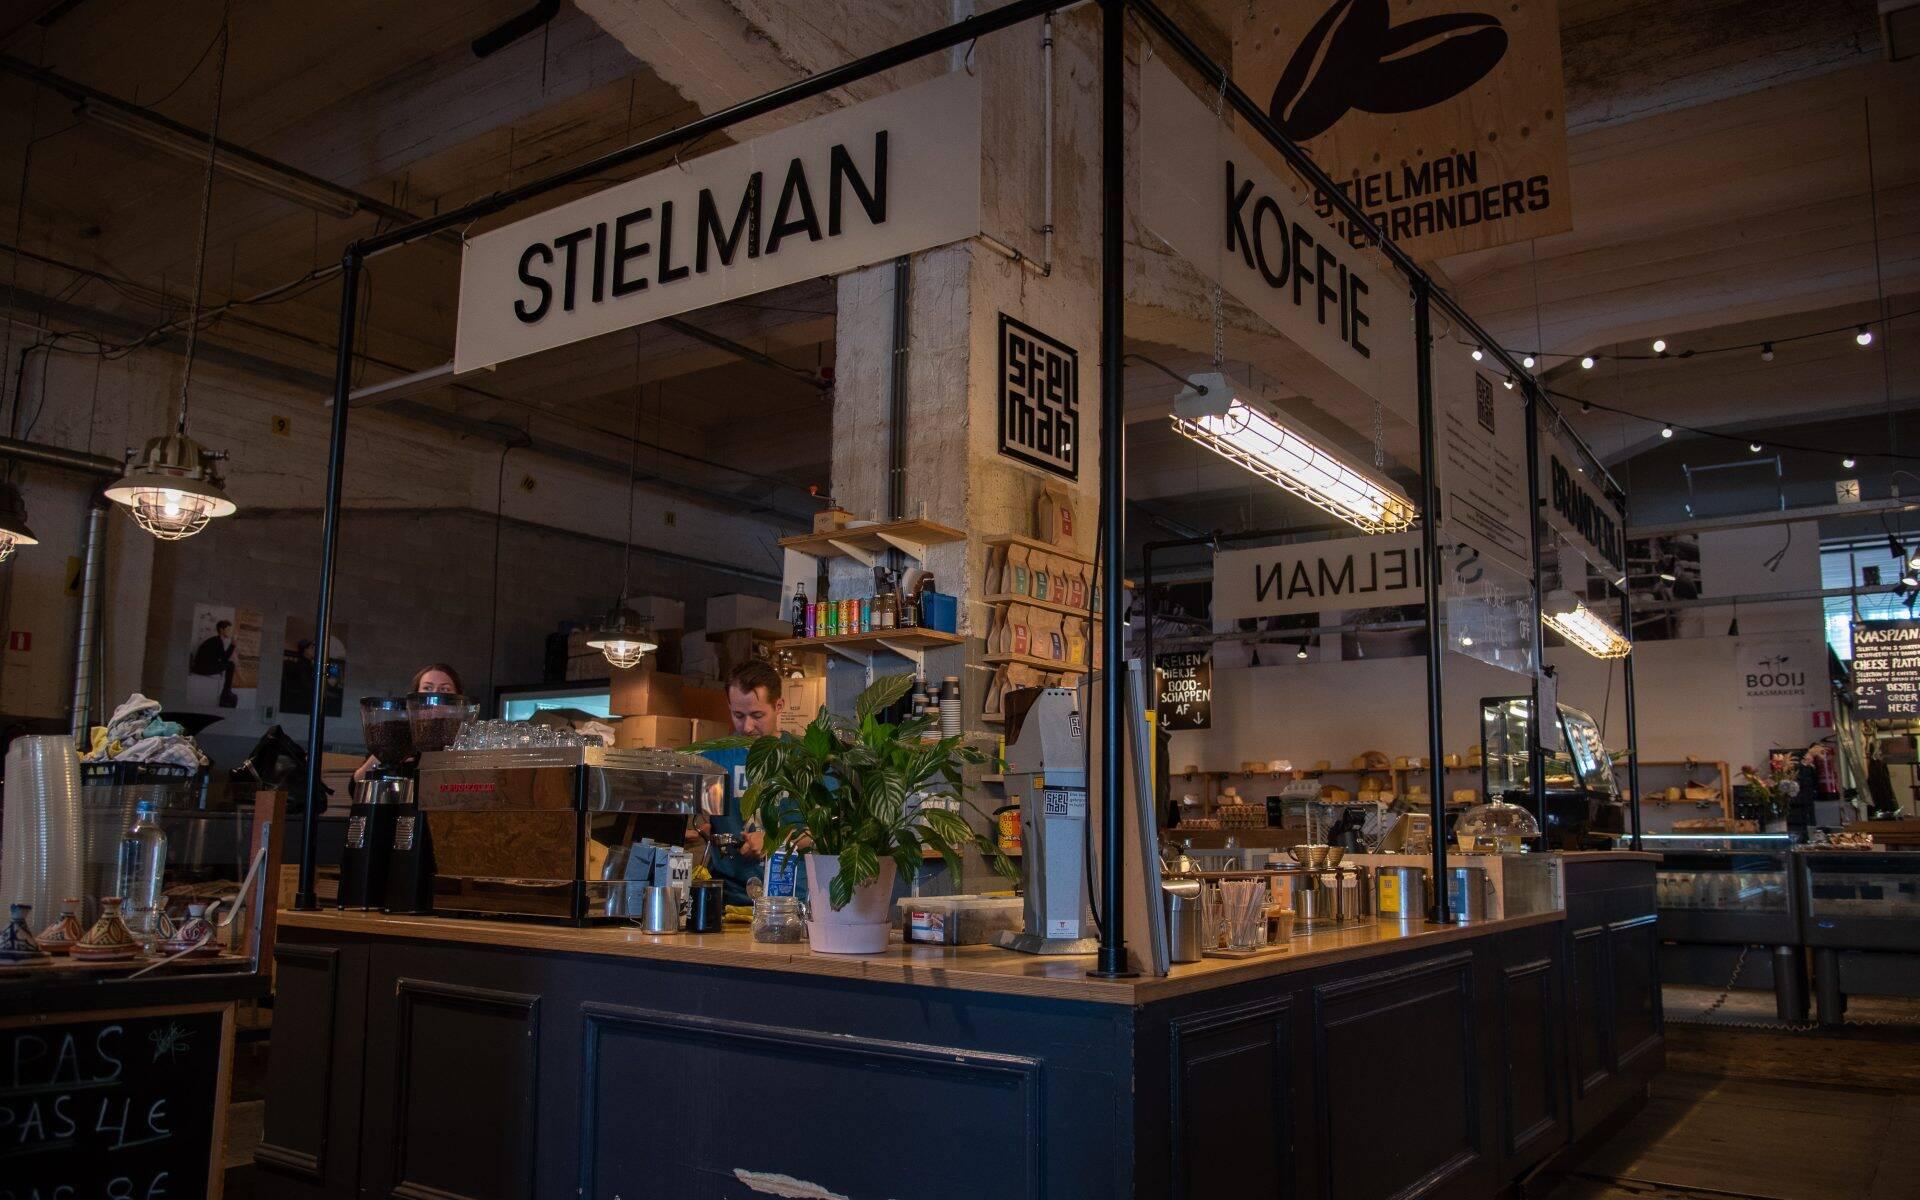 Stielman Koffiebranders Rotterdam